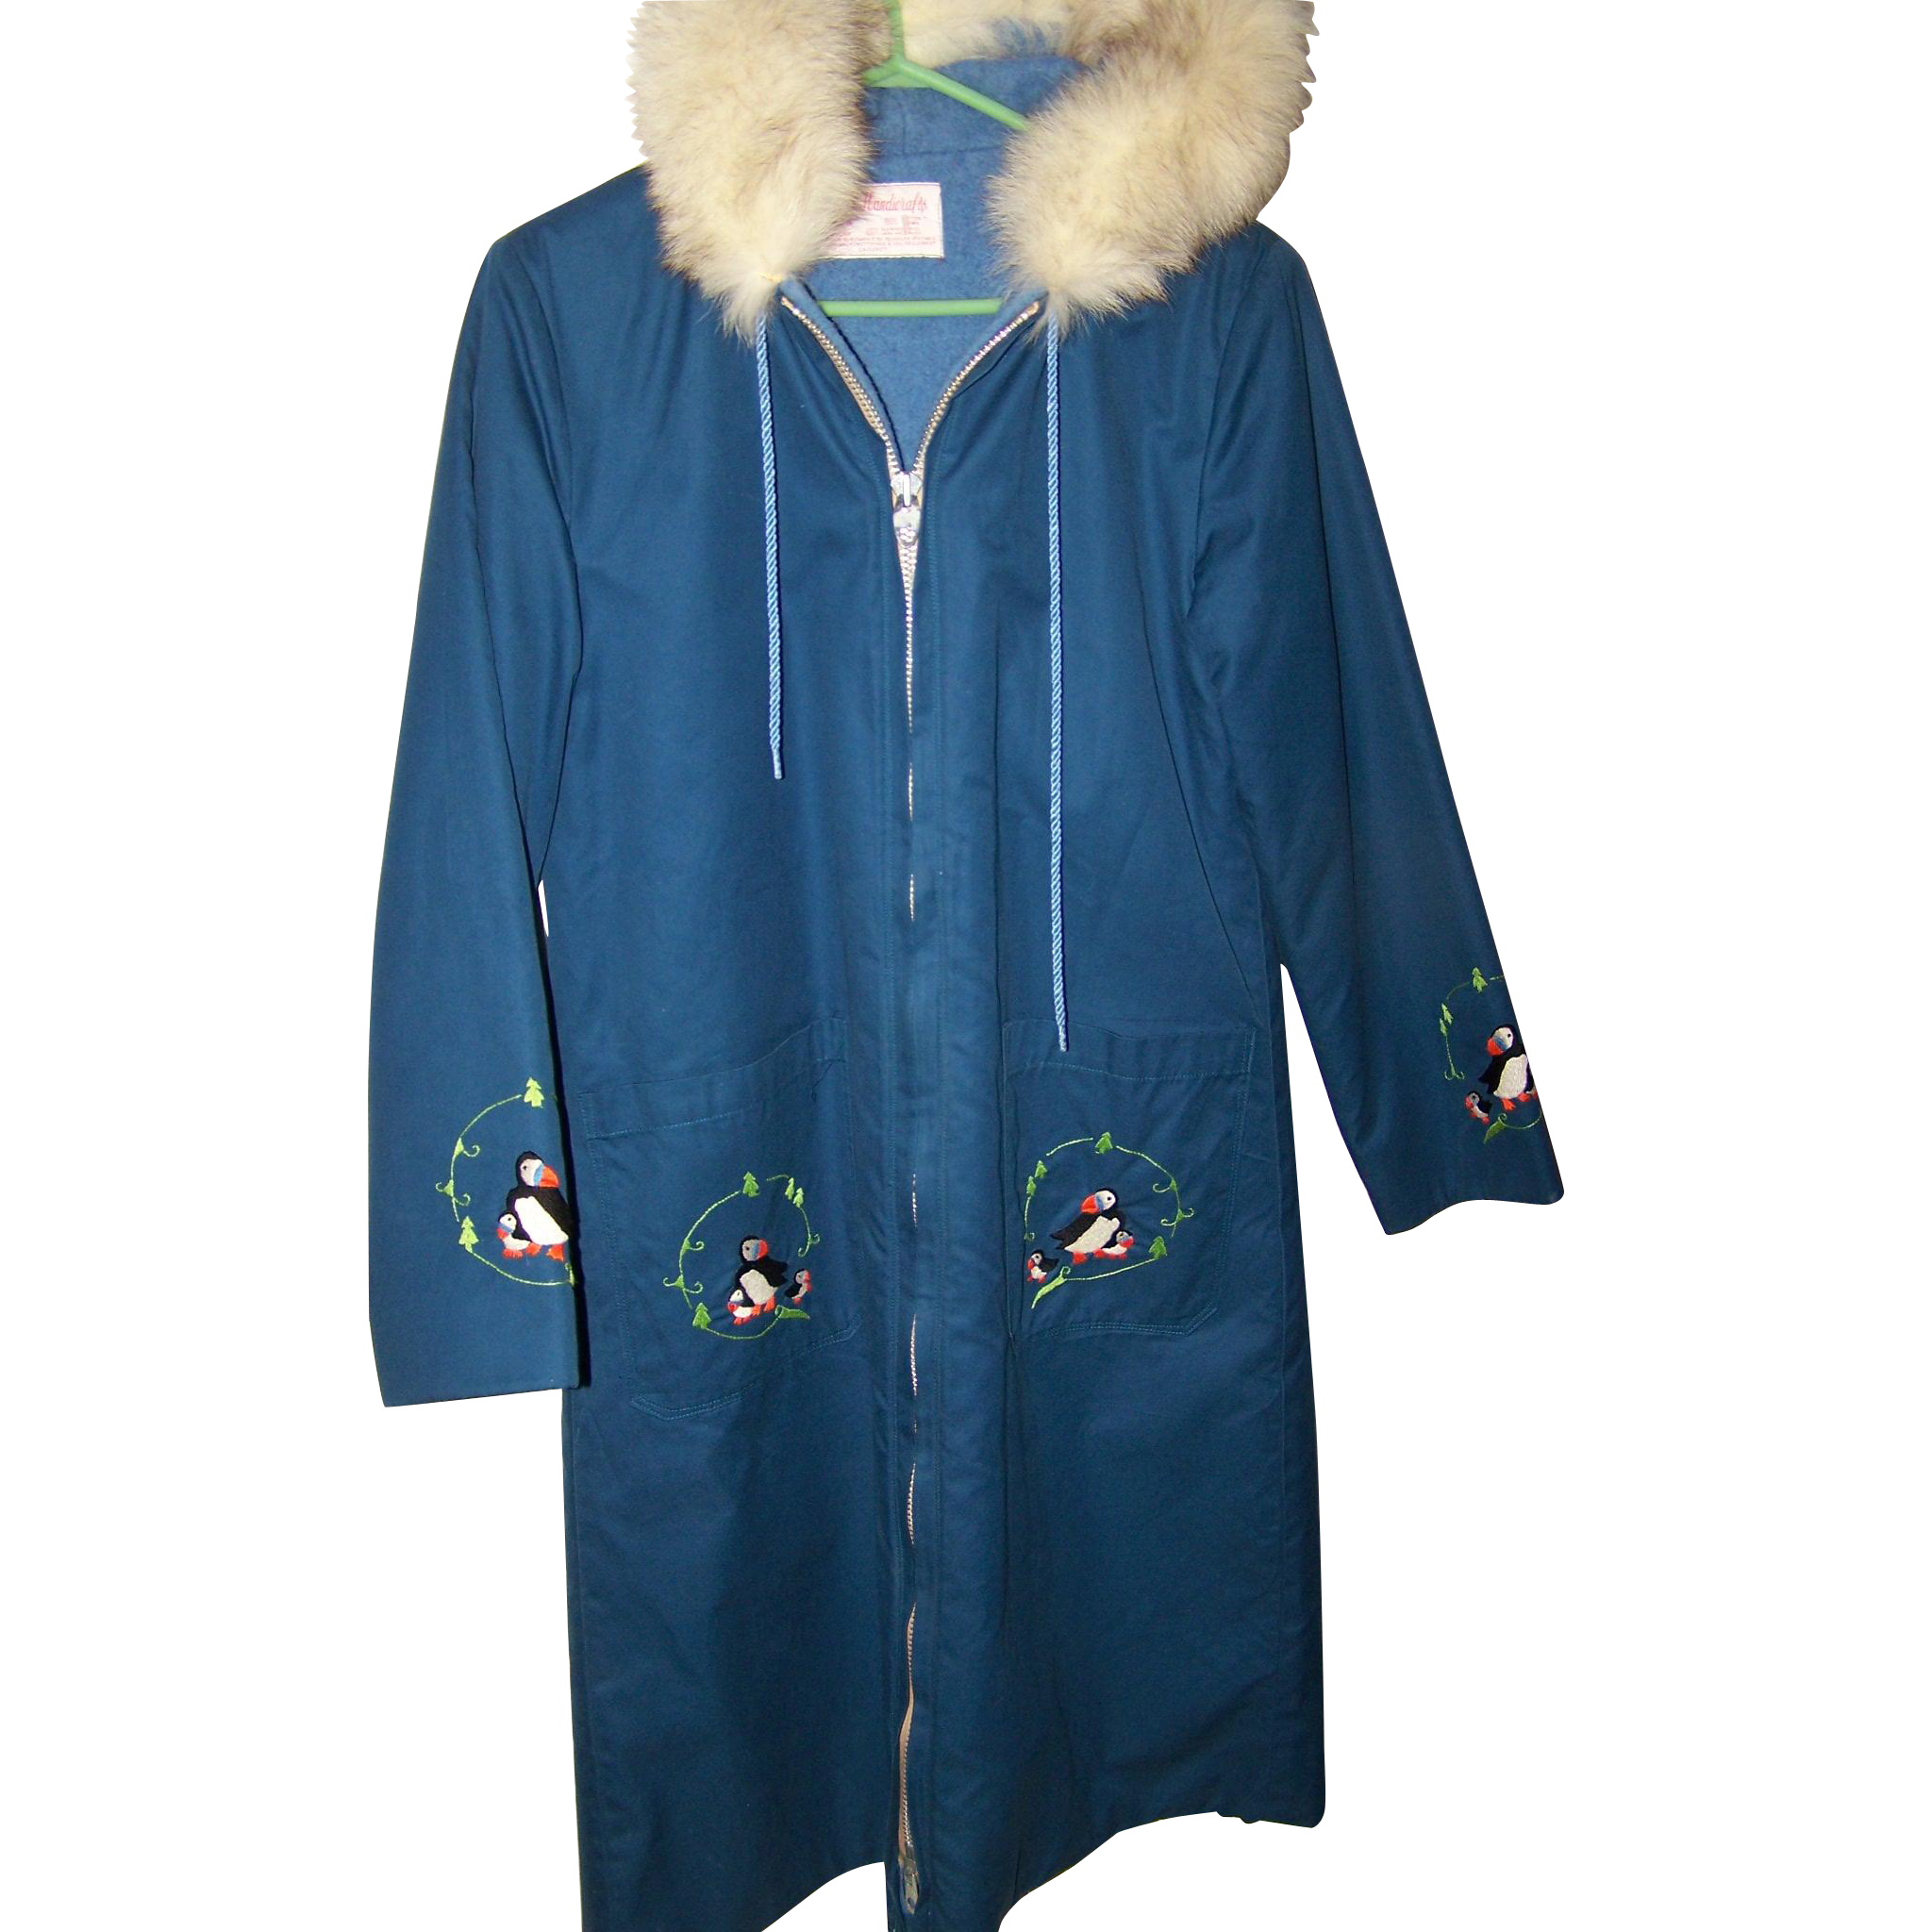 Long Coat Parka Grenfell Handicrafts Fox Fur Collar Canadian Made in Canada